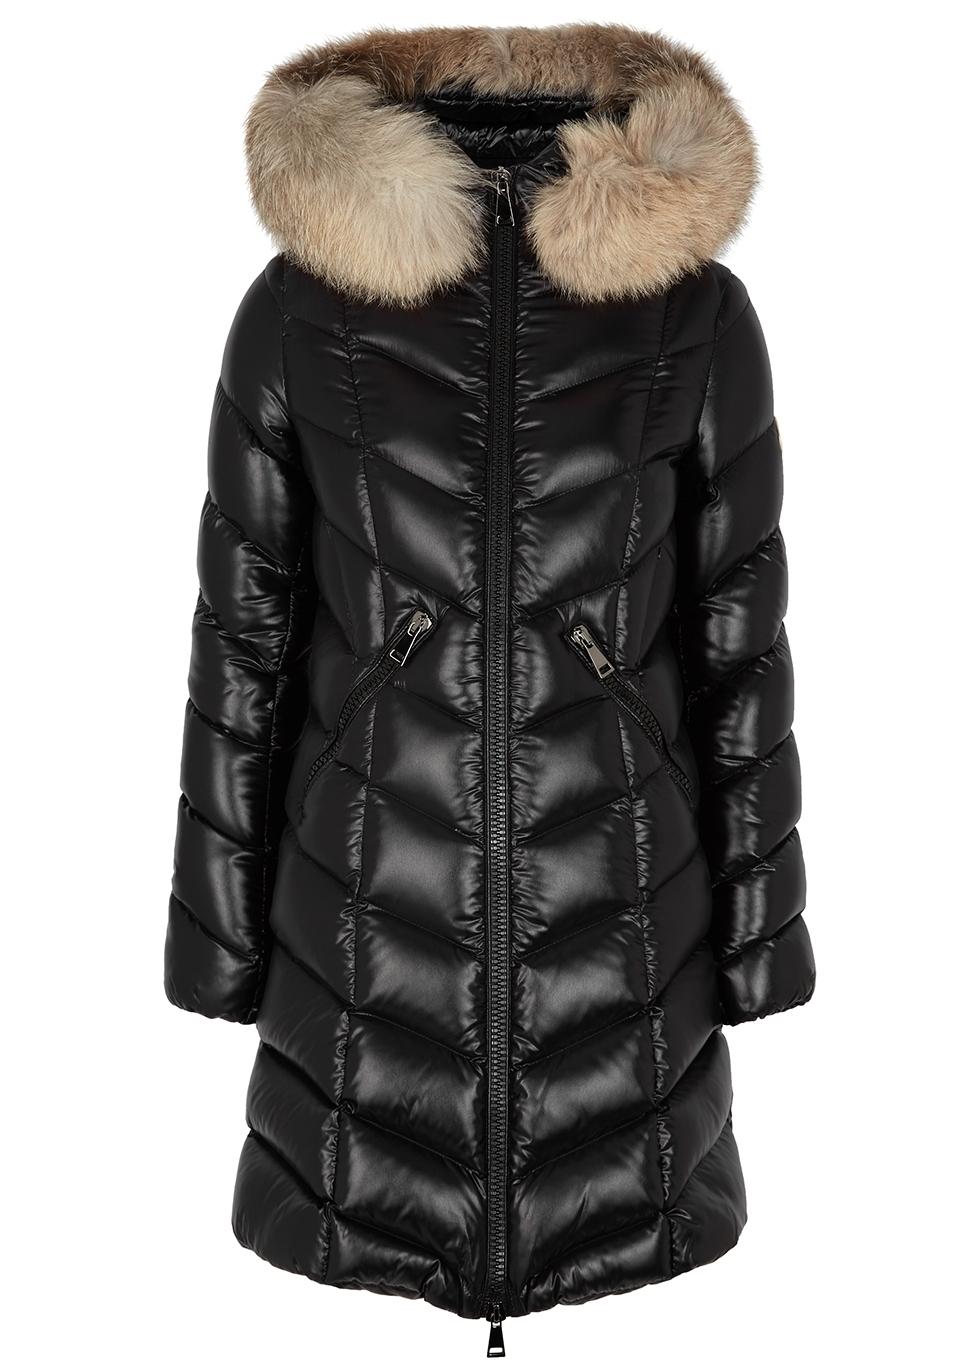 88b46e57ca29b Moncler - Designer Jackets, Coats, Gilets - Harvey Nichols